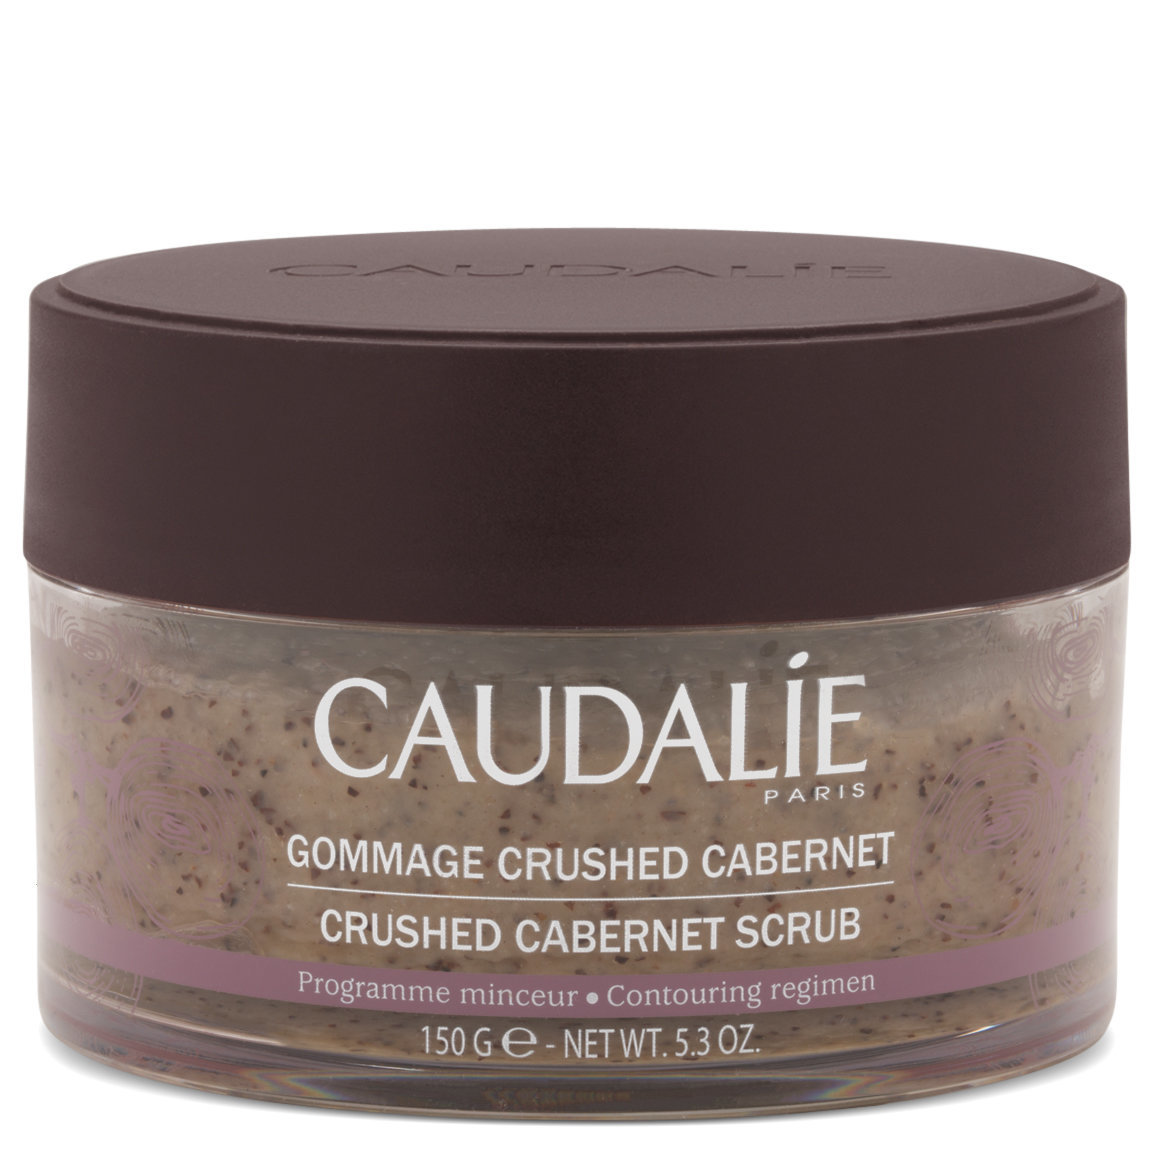 Caudalie Crushed Cabernet Scrub alternative view 1 - product swatch.